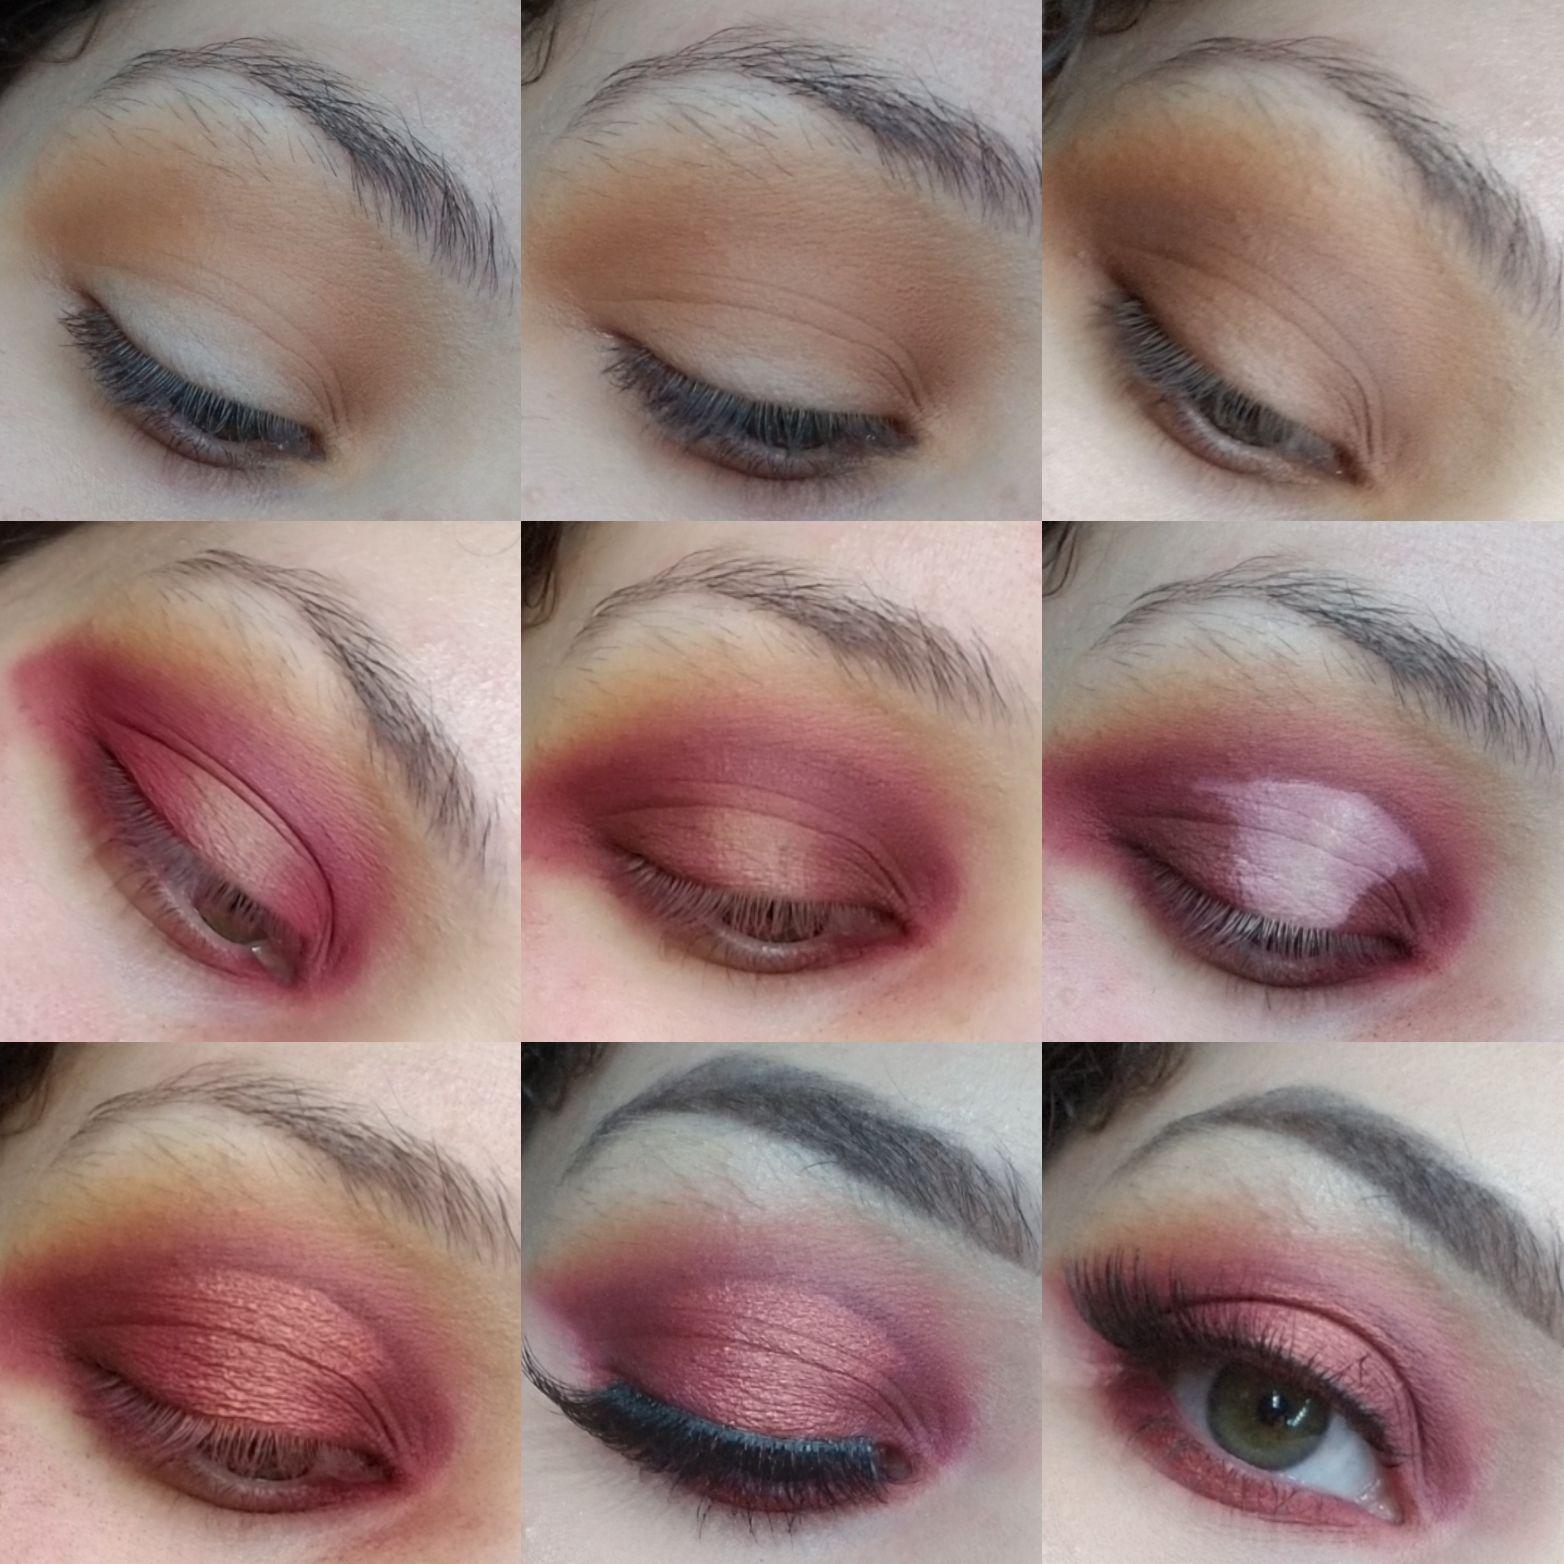 Smokey Halo Valentine's Day Makeup Day makeup